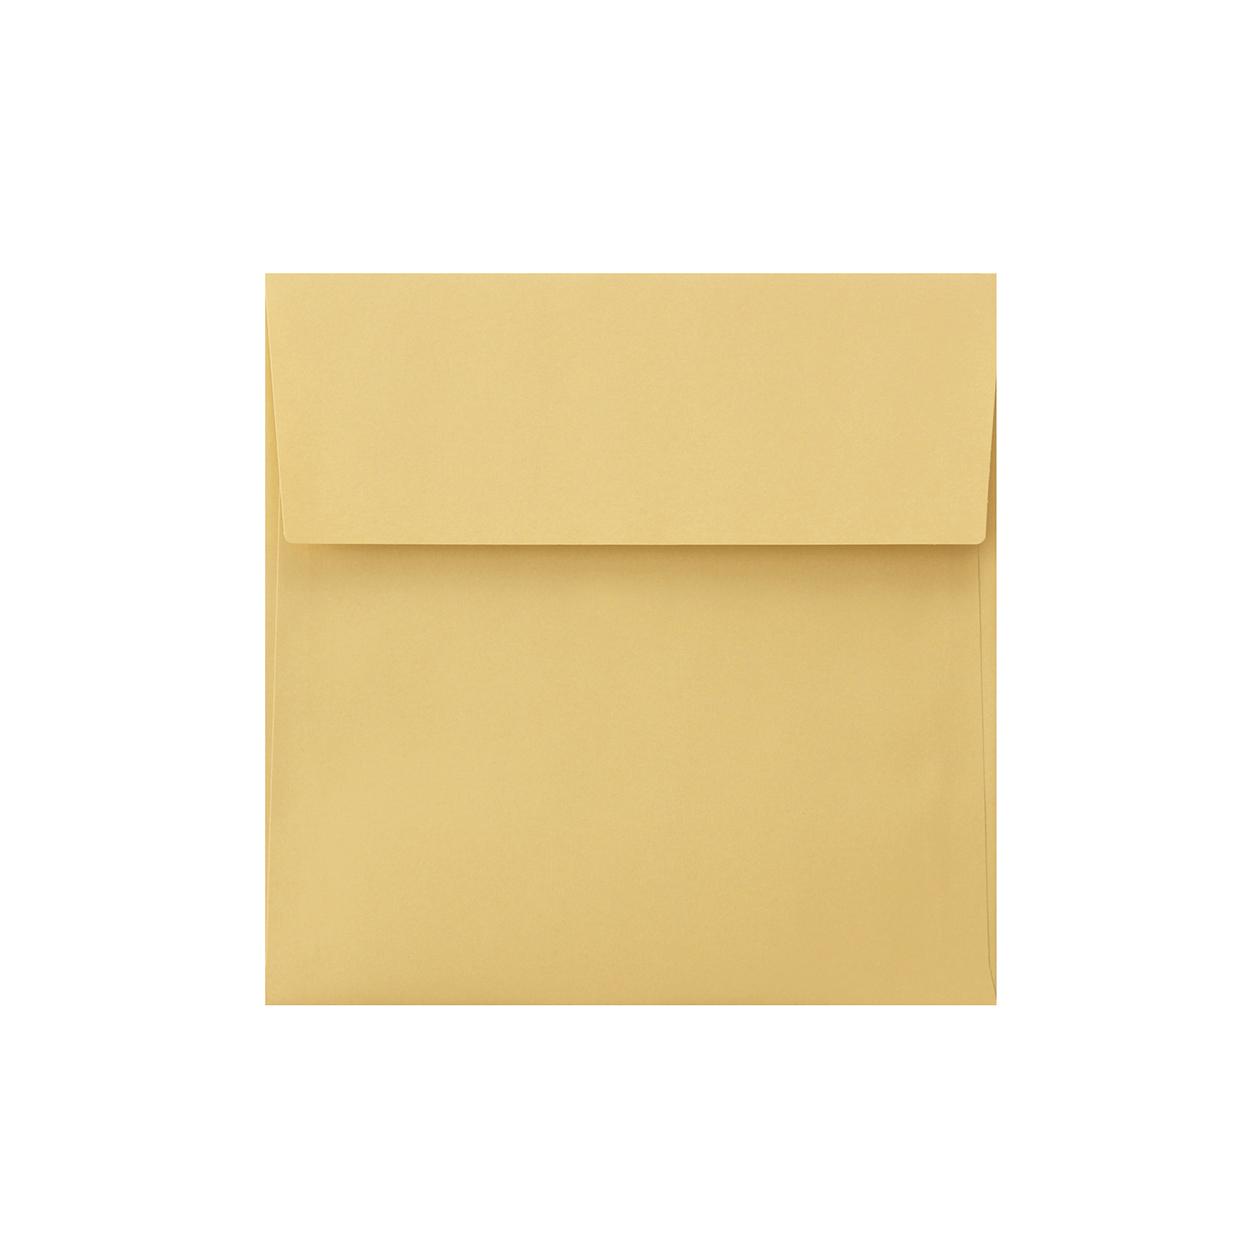 SE16カマス封筒 上質カラー ゴールド 97.4g